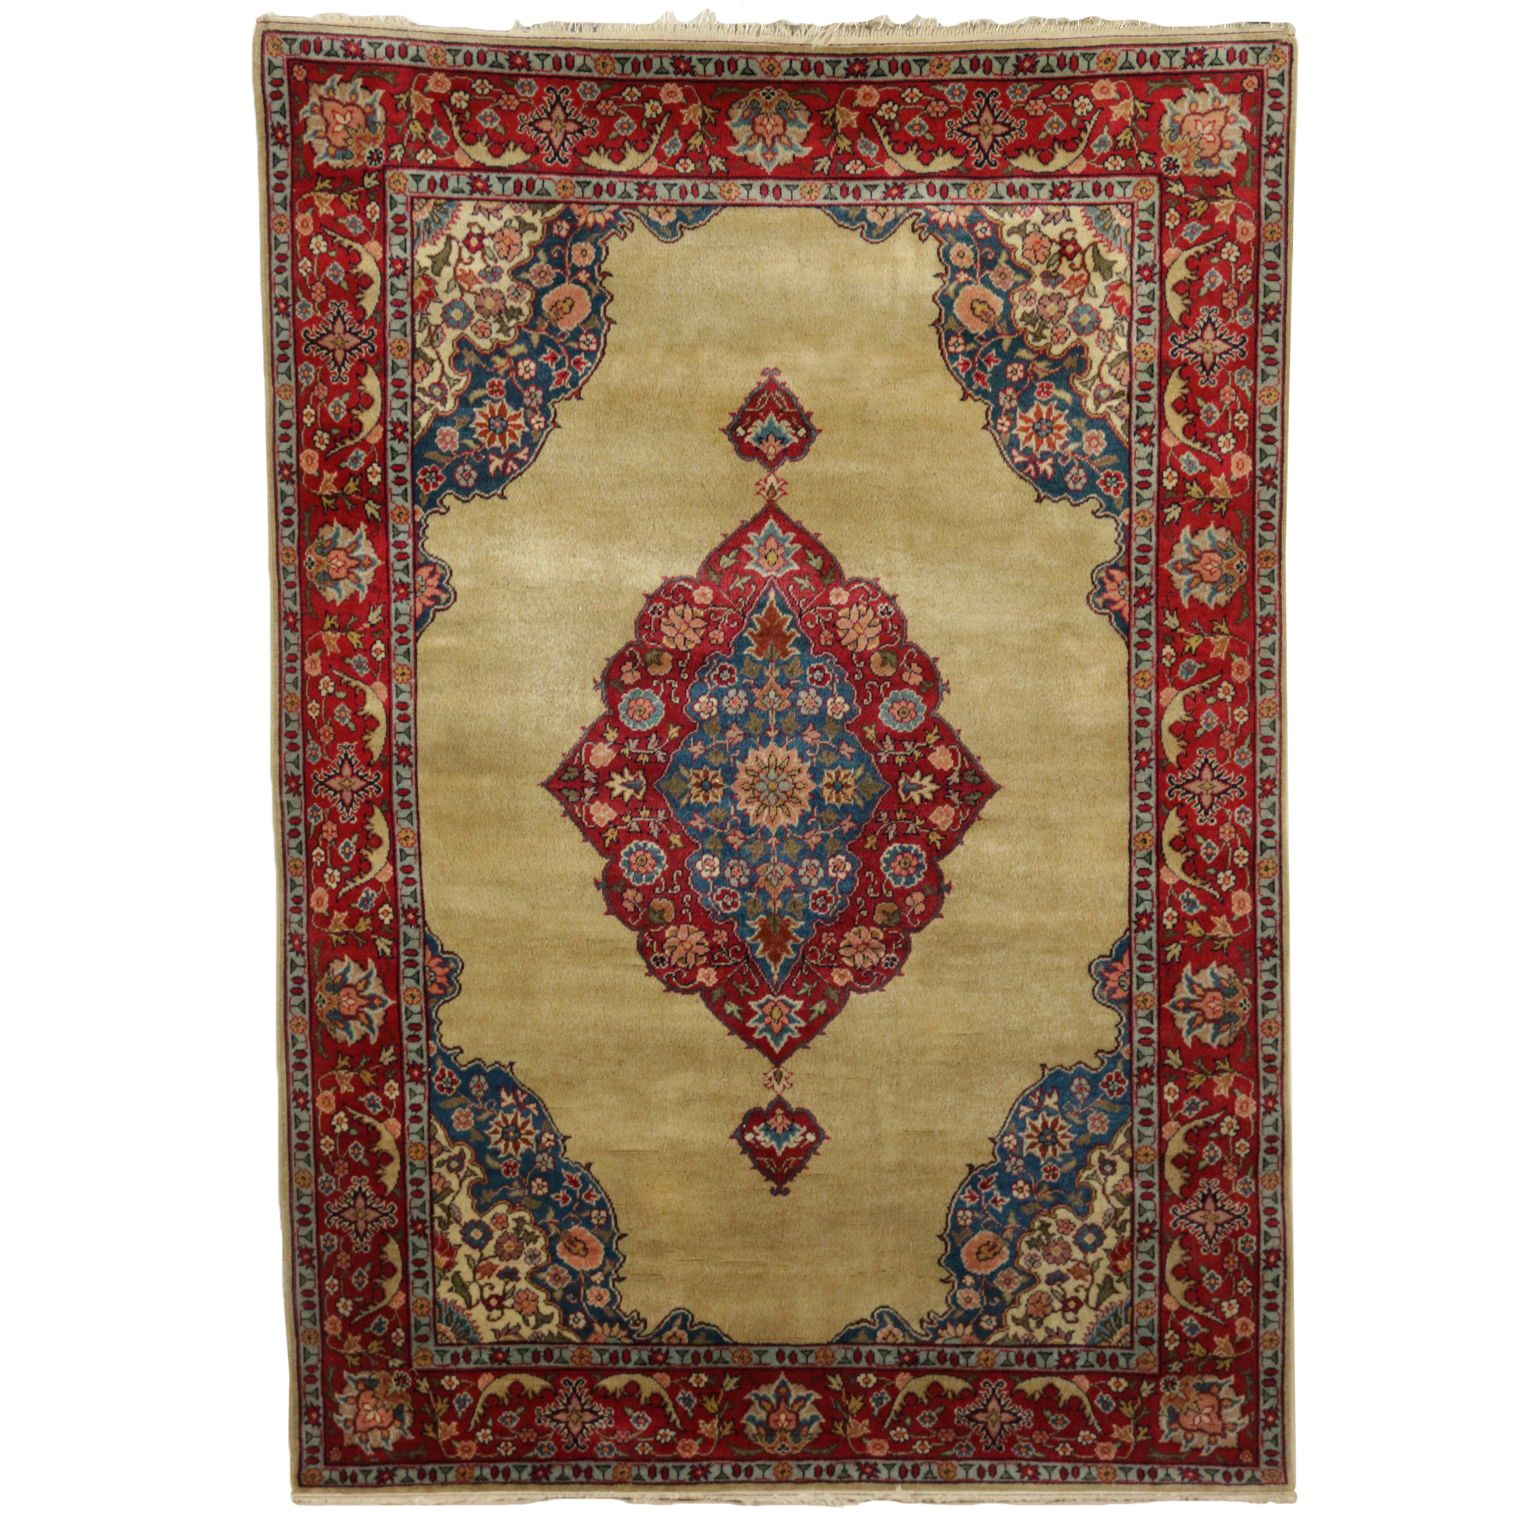 Handmade Yazd Rug Iran 1980s 1990s Rugs Carpet Antiques